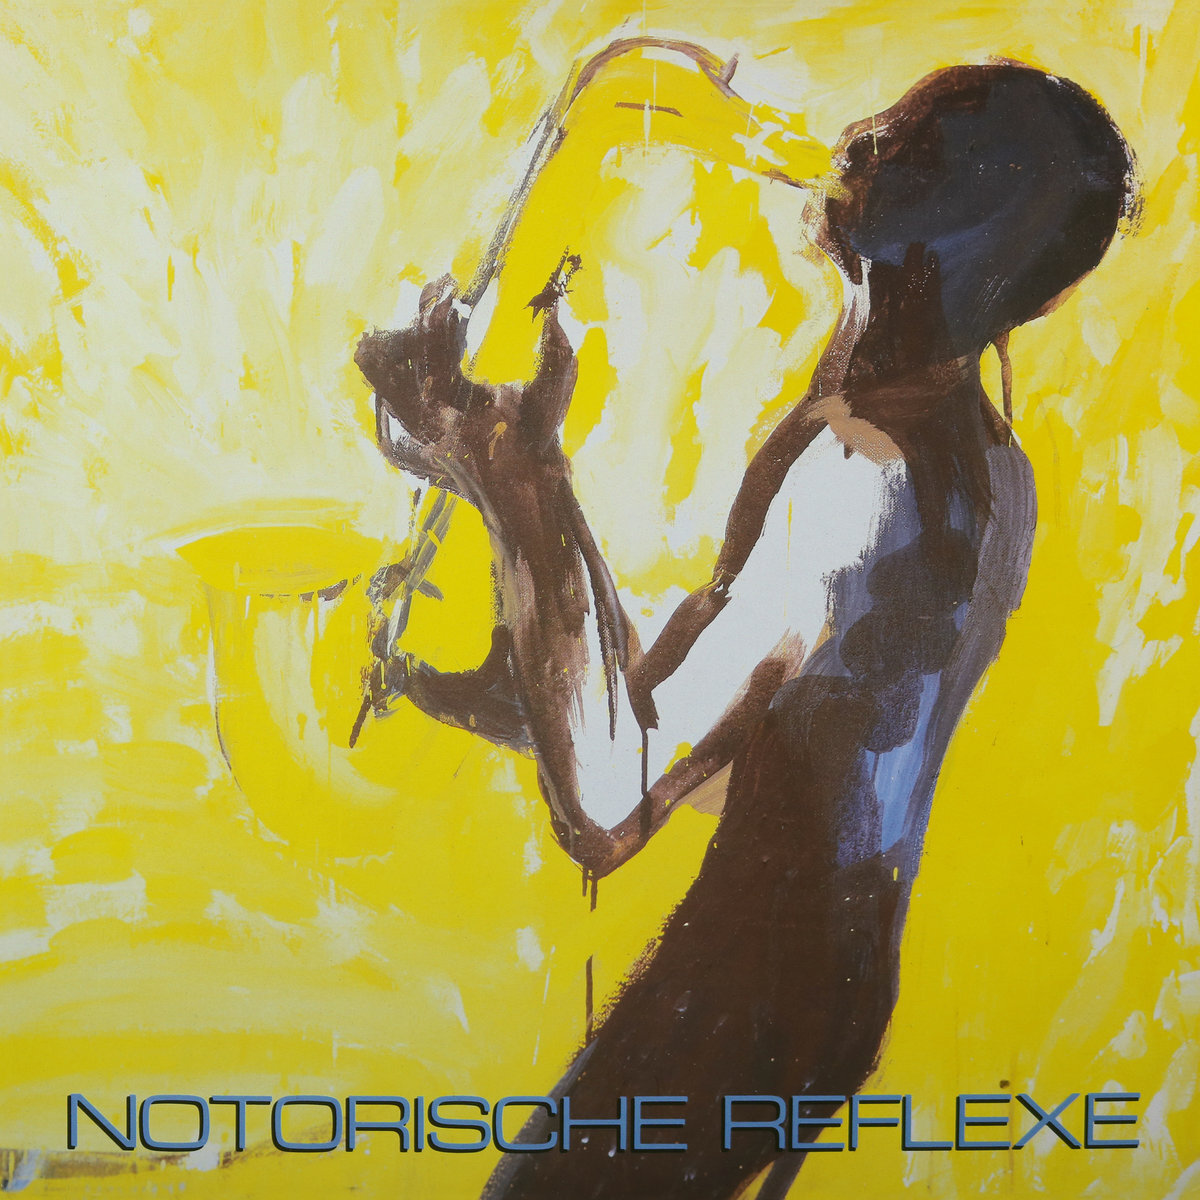 Notorische Reflexe - Notorische Reflexe (LP)